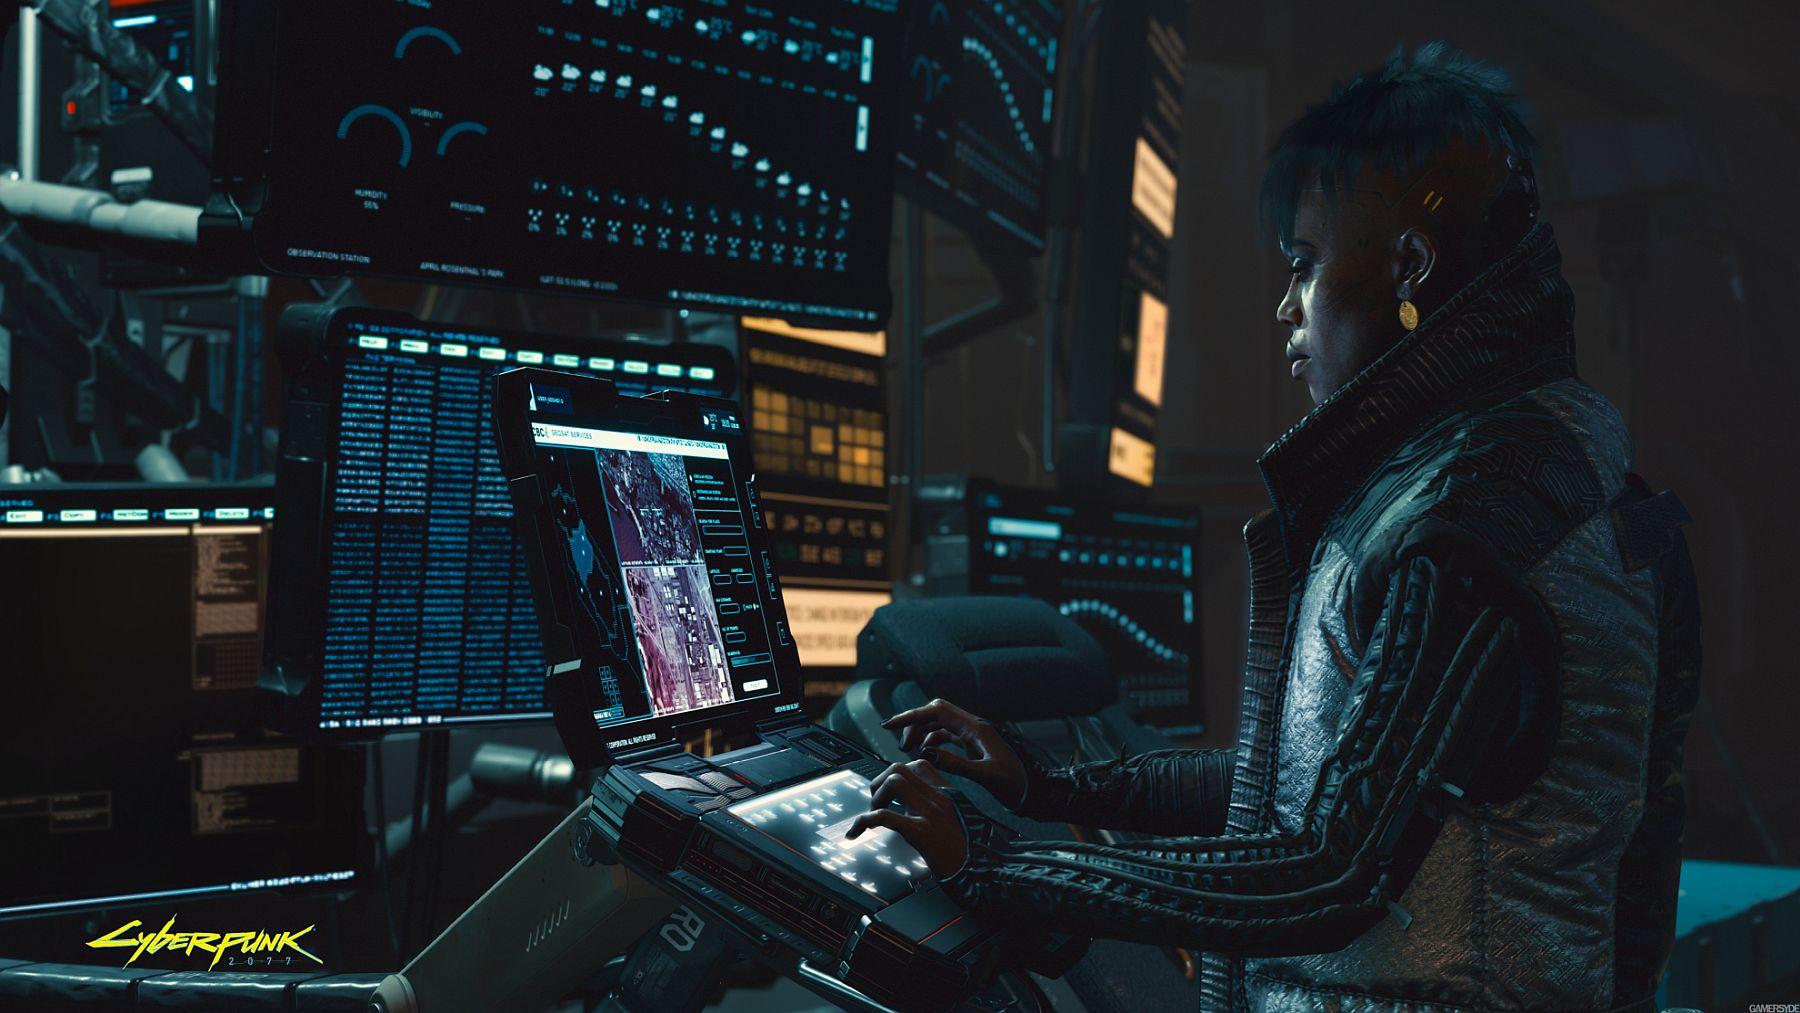 Cyberpunk 2077 will have multiple endings - VG247